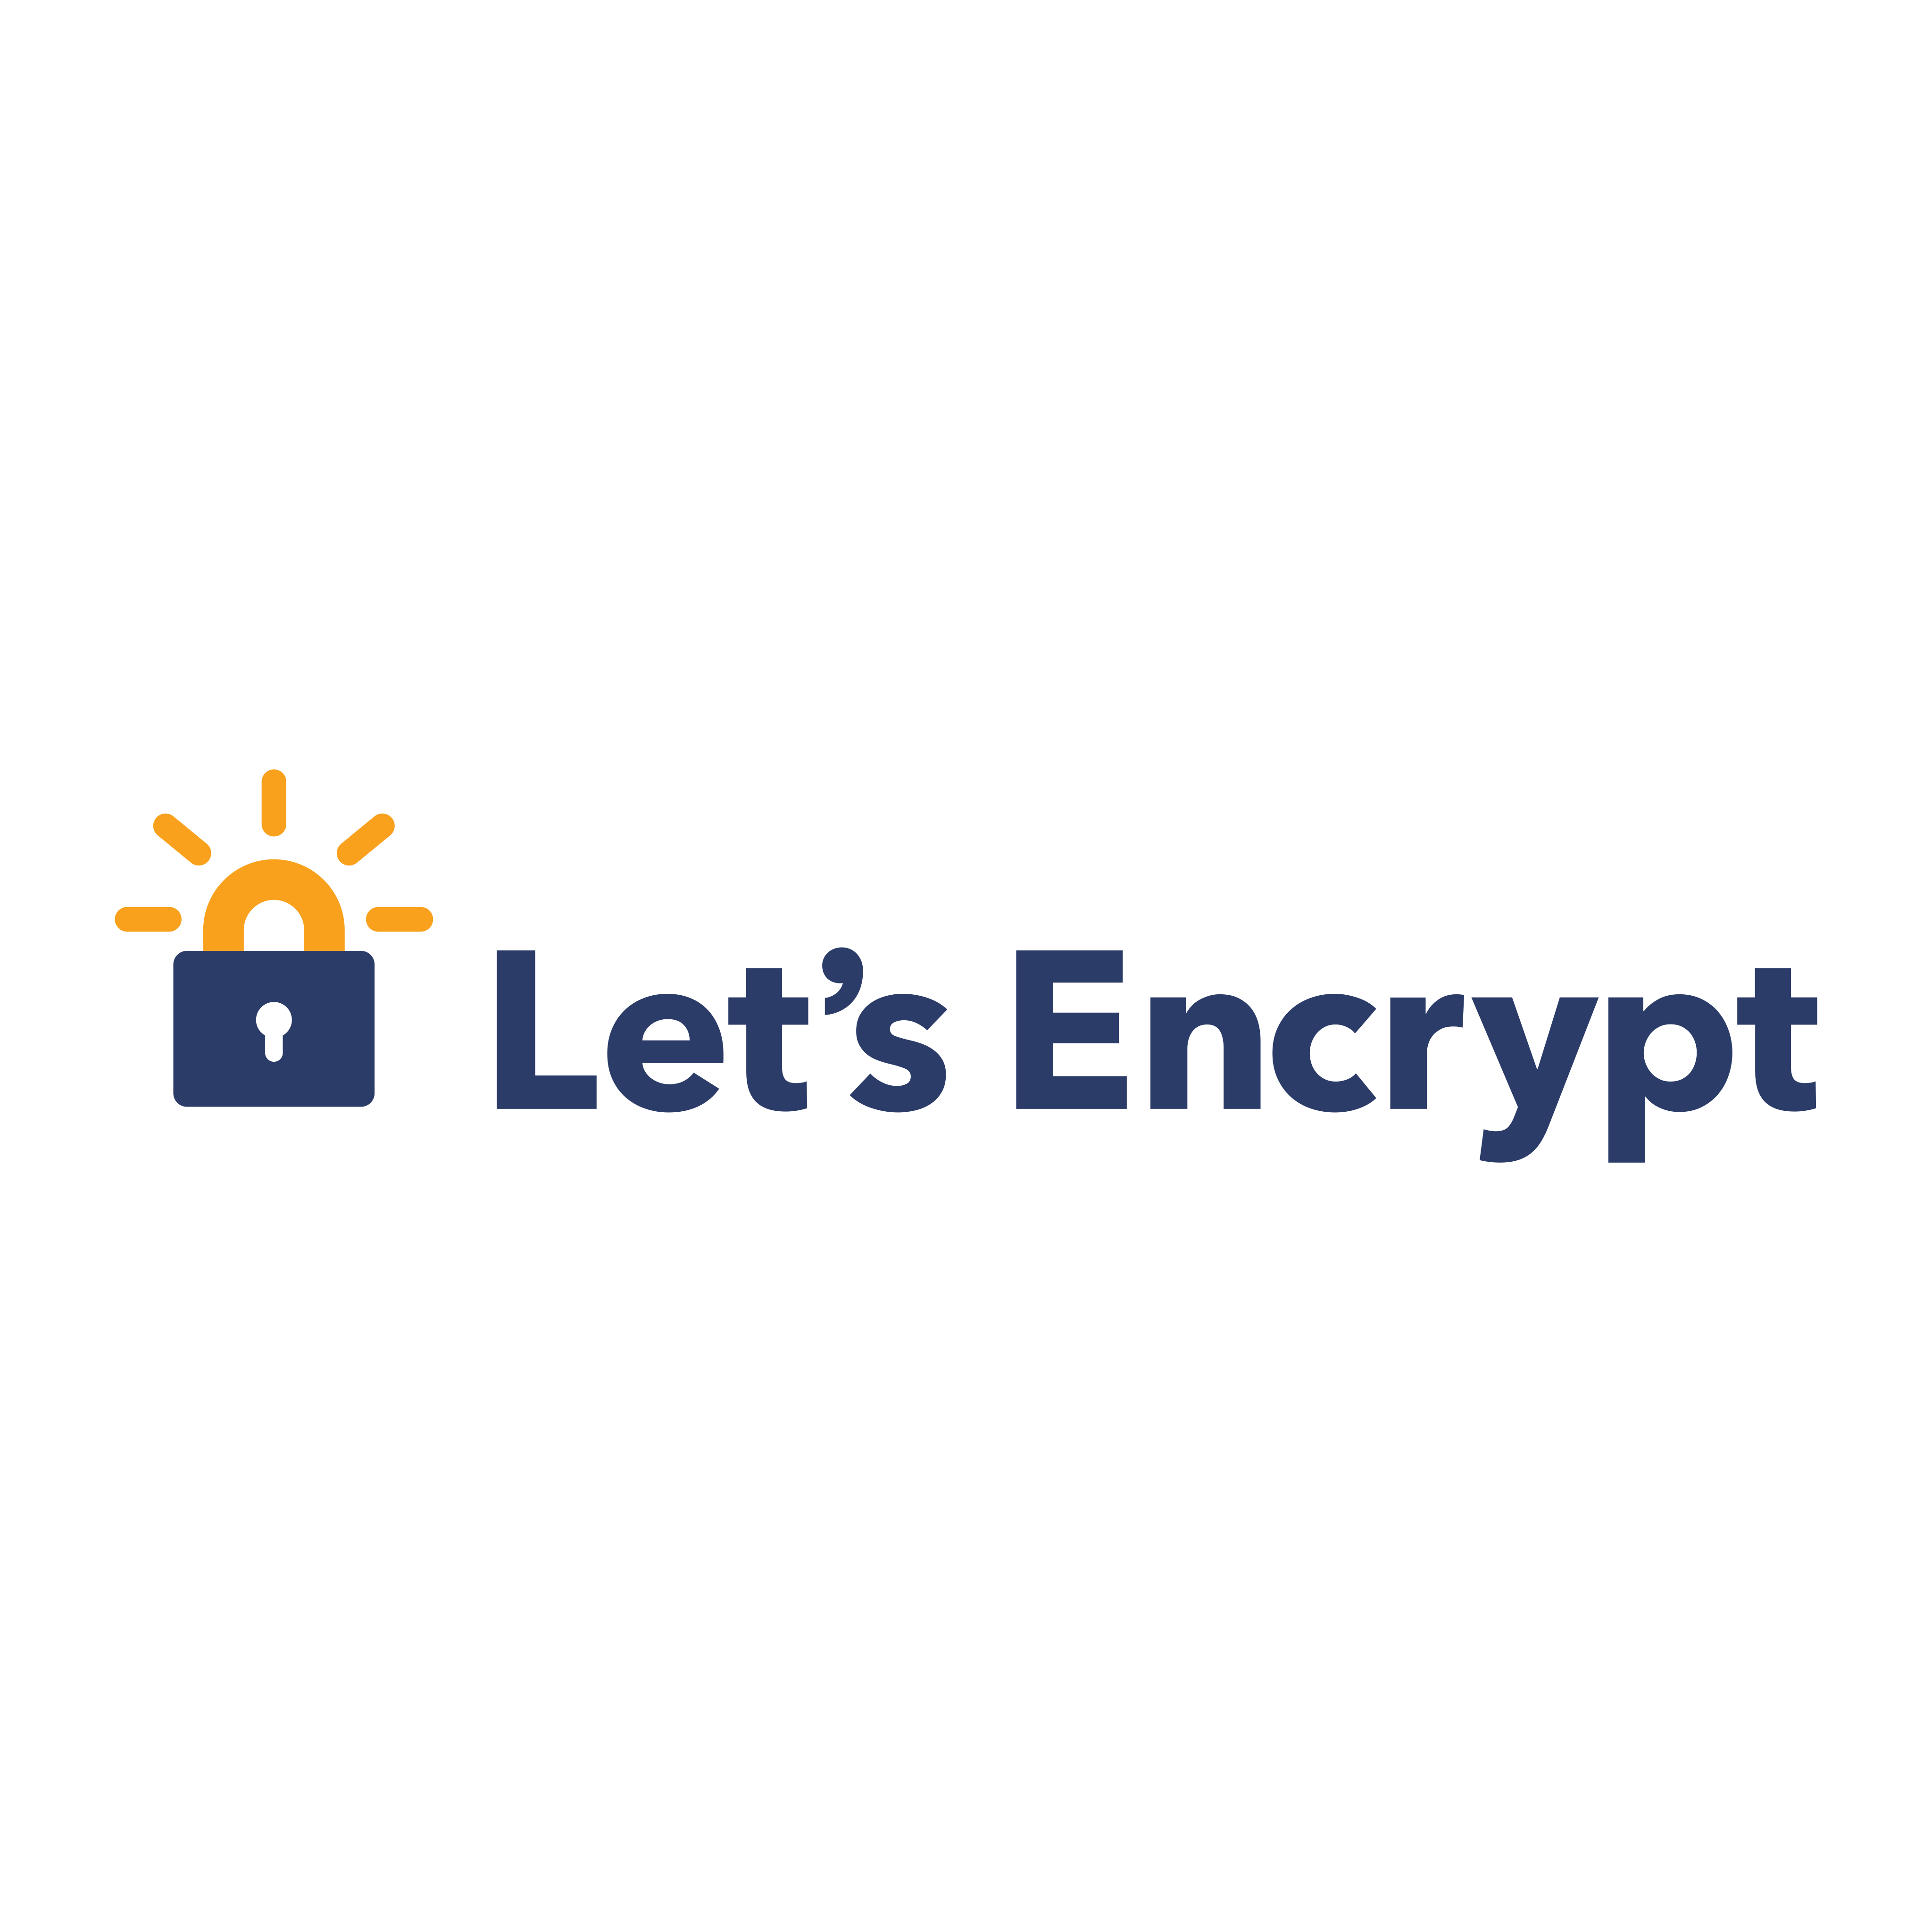 lets encrypt logo 0 - Let's Encrypt Logo